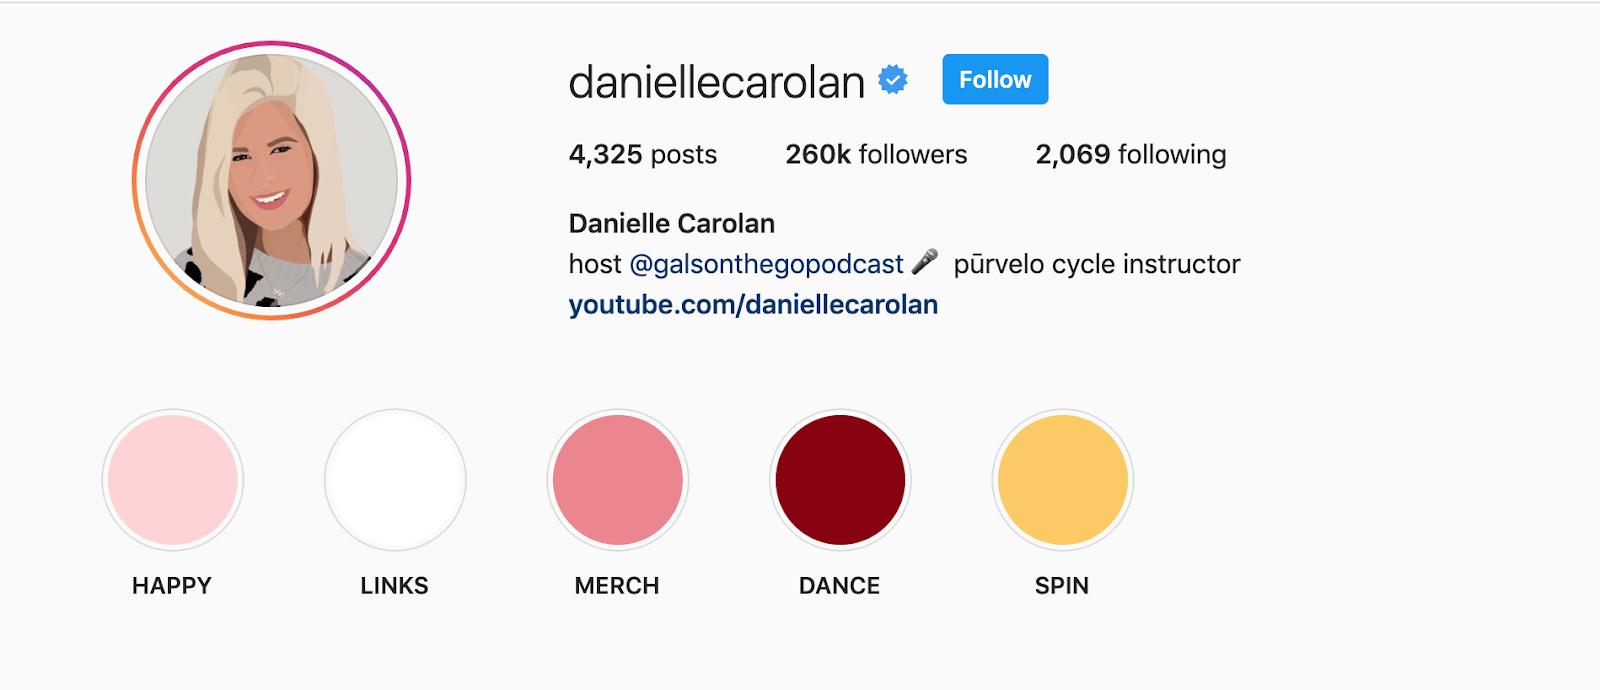 danielle carolan optimize your instagram bio highlights